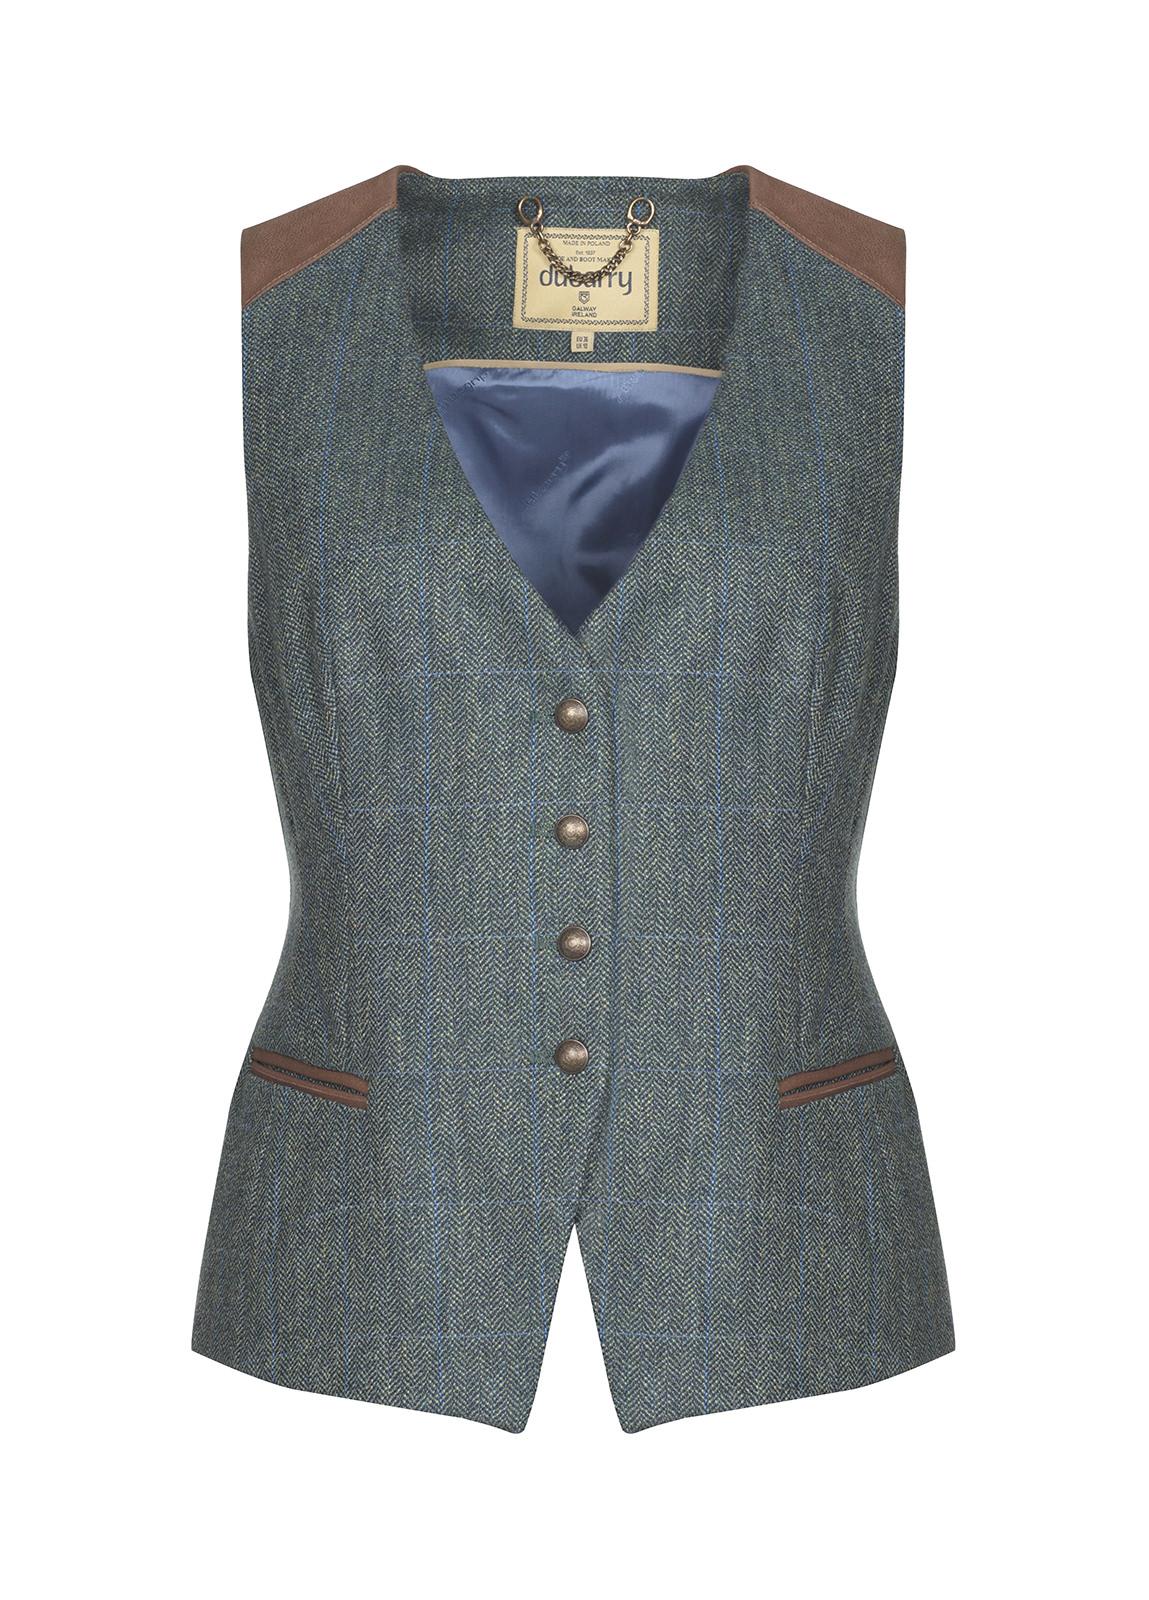 Dubarry_ Daisy Fitted Tweed Waistcoat - Mist_Image_2